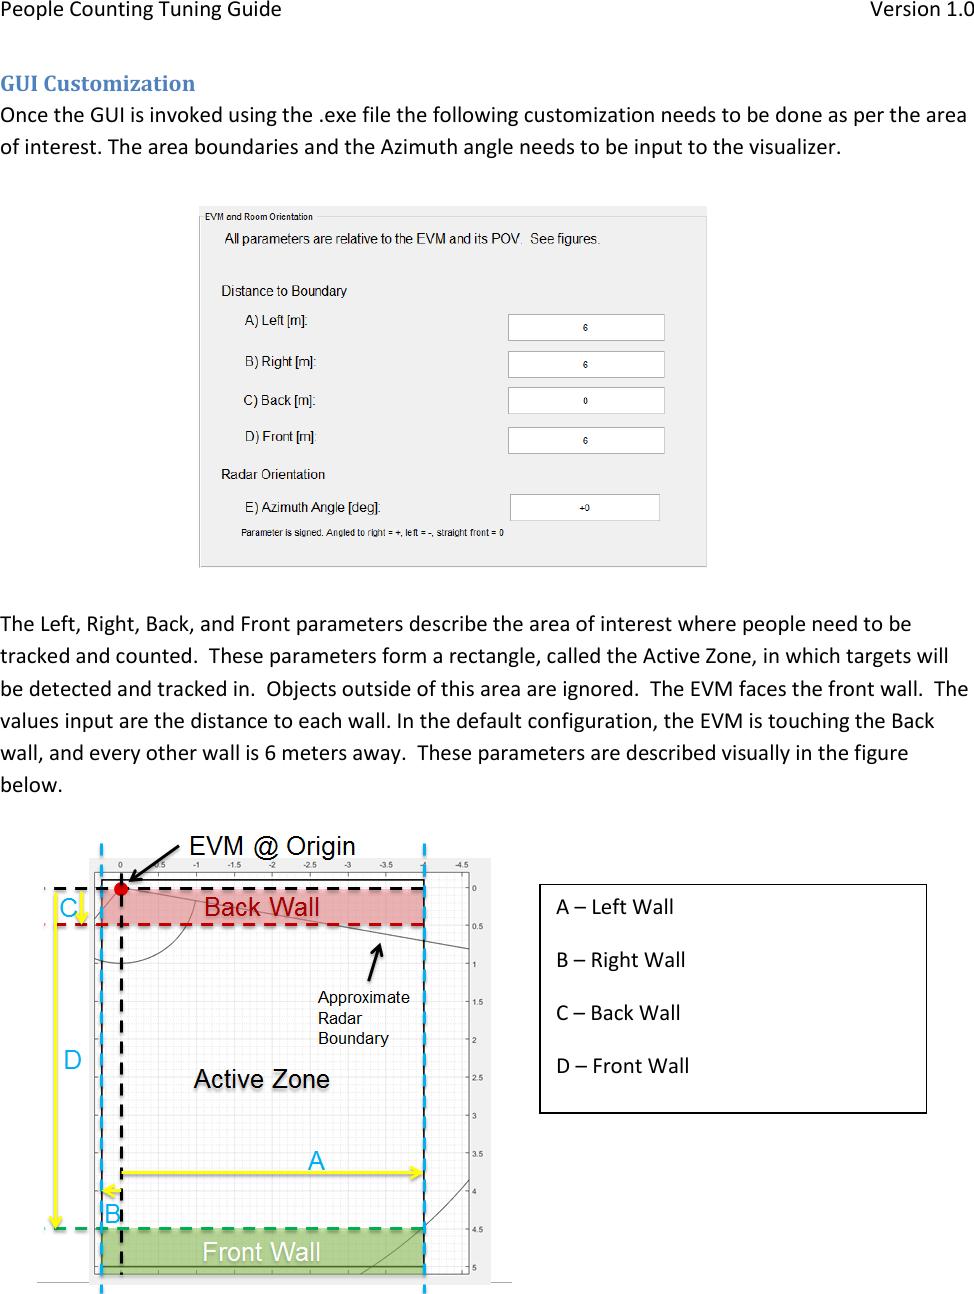 Pplcount Customization Guide